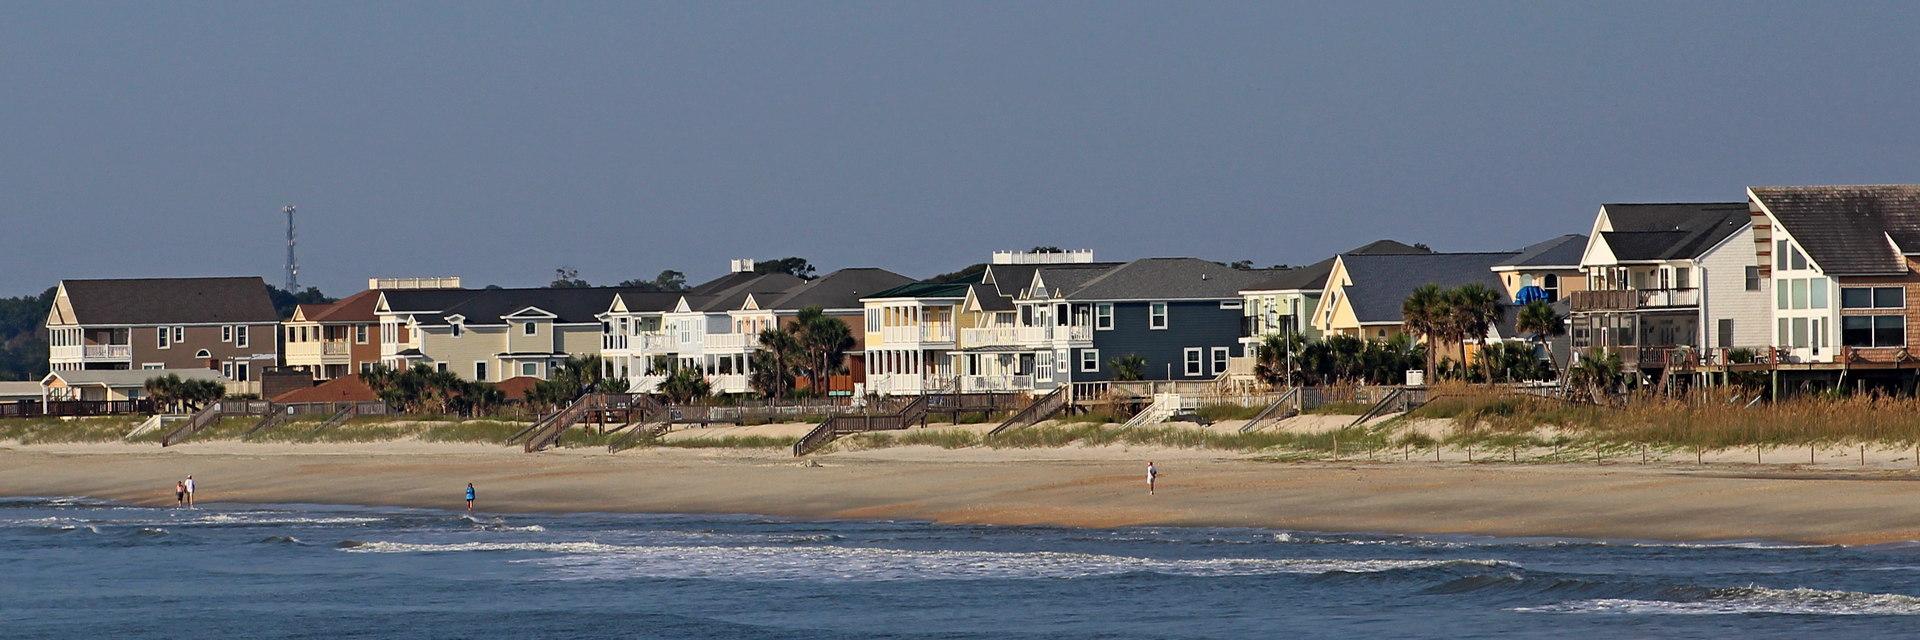 Ocean Front Homes in the Long Bay neighborhood near Myrtle Beach SC